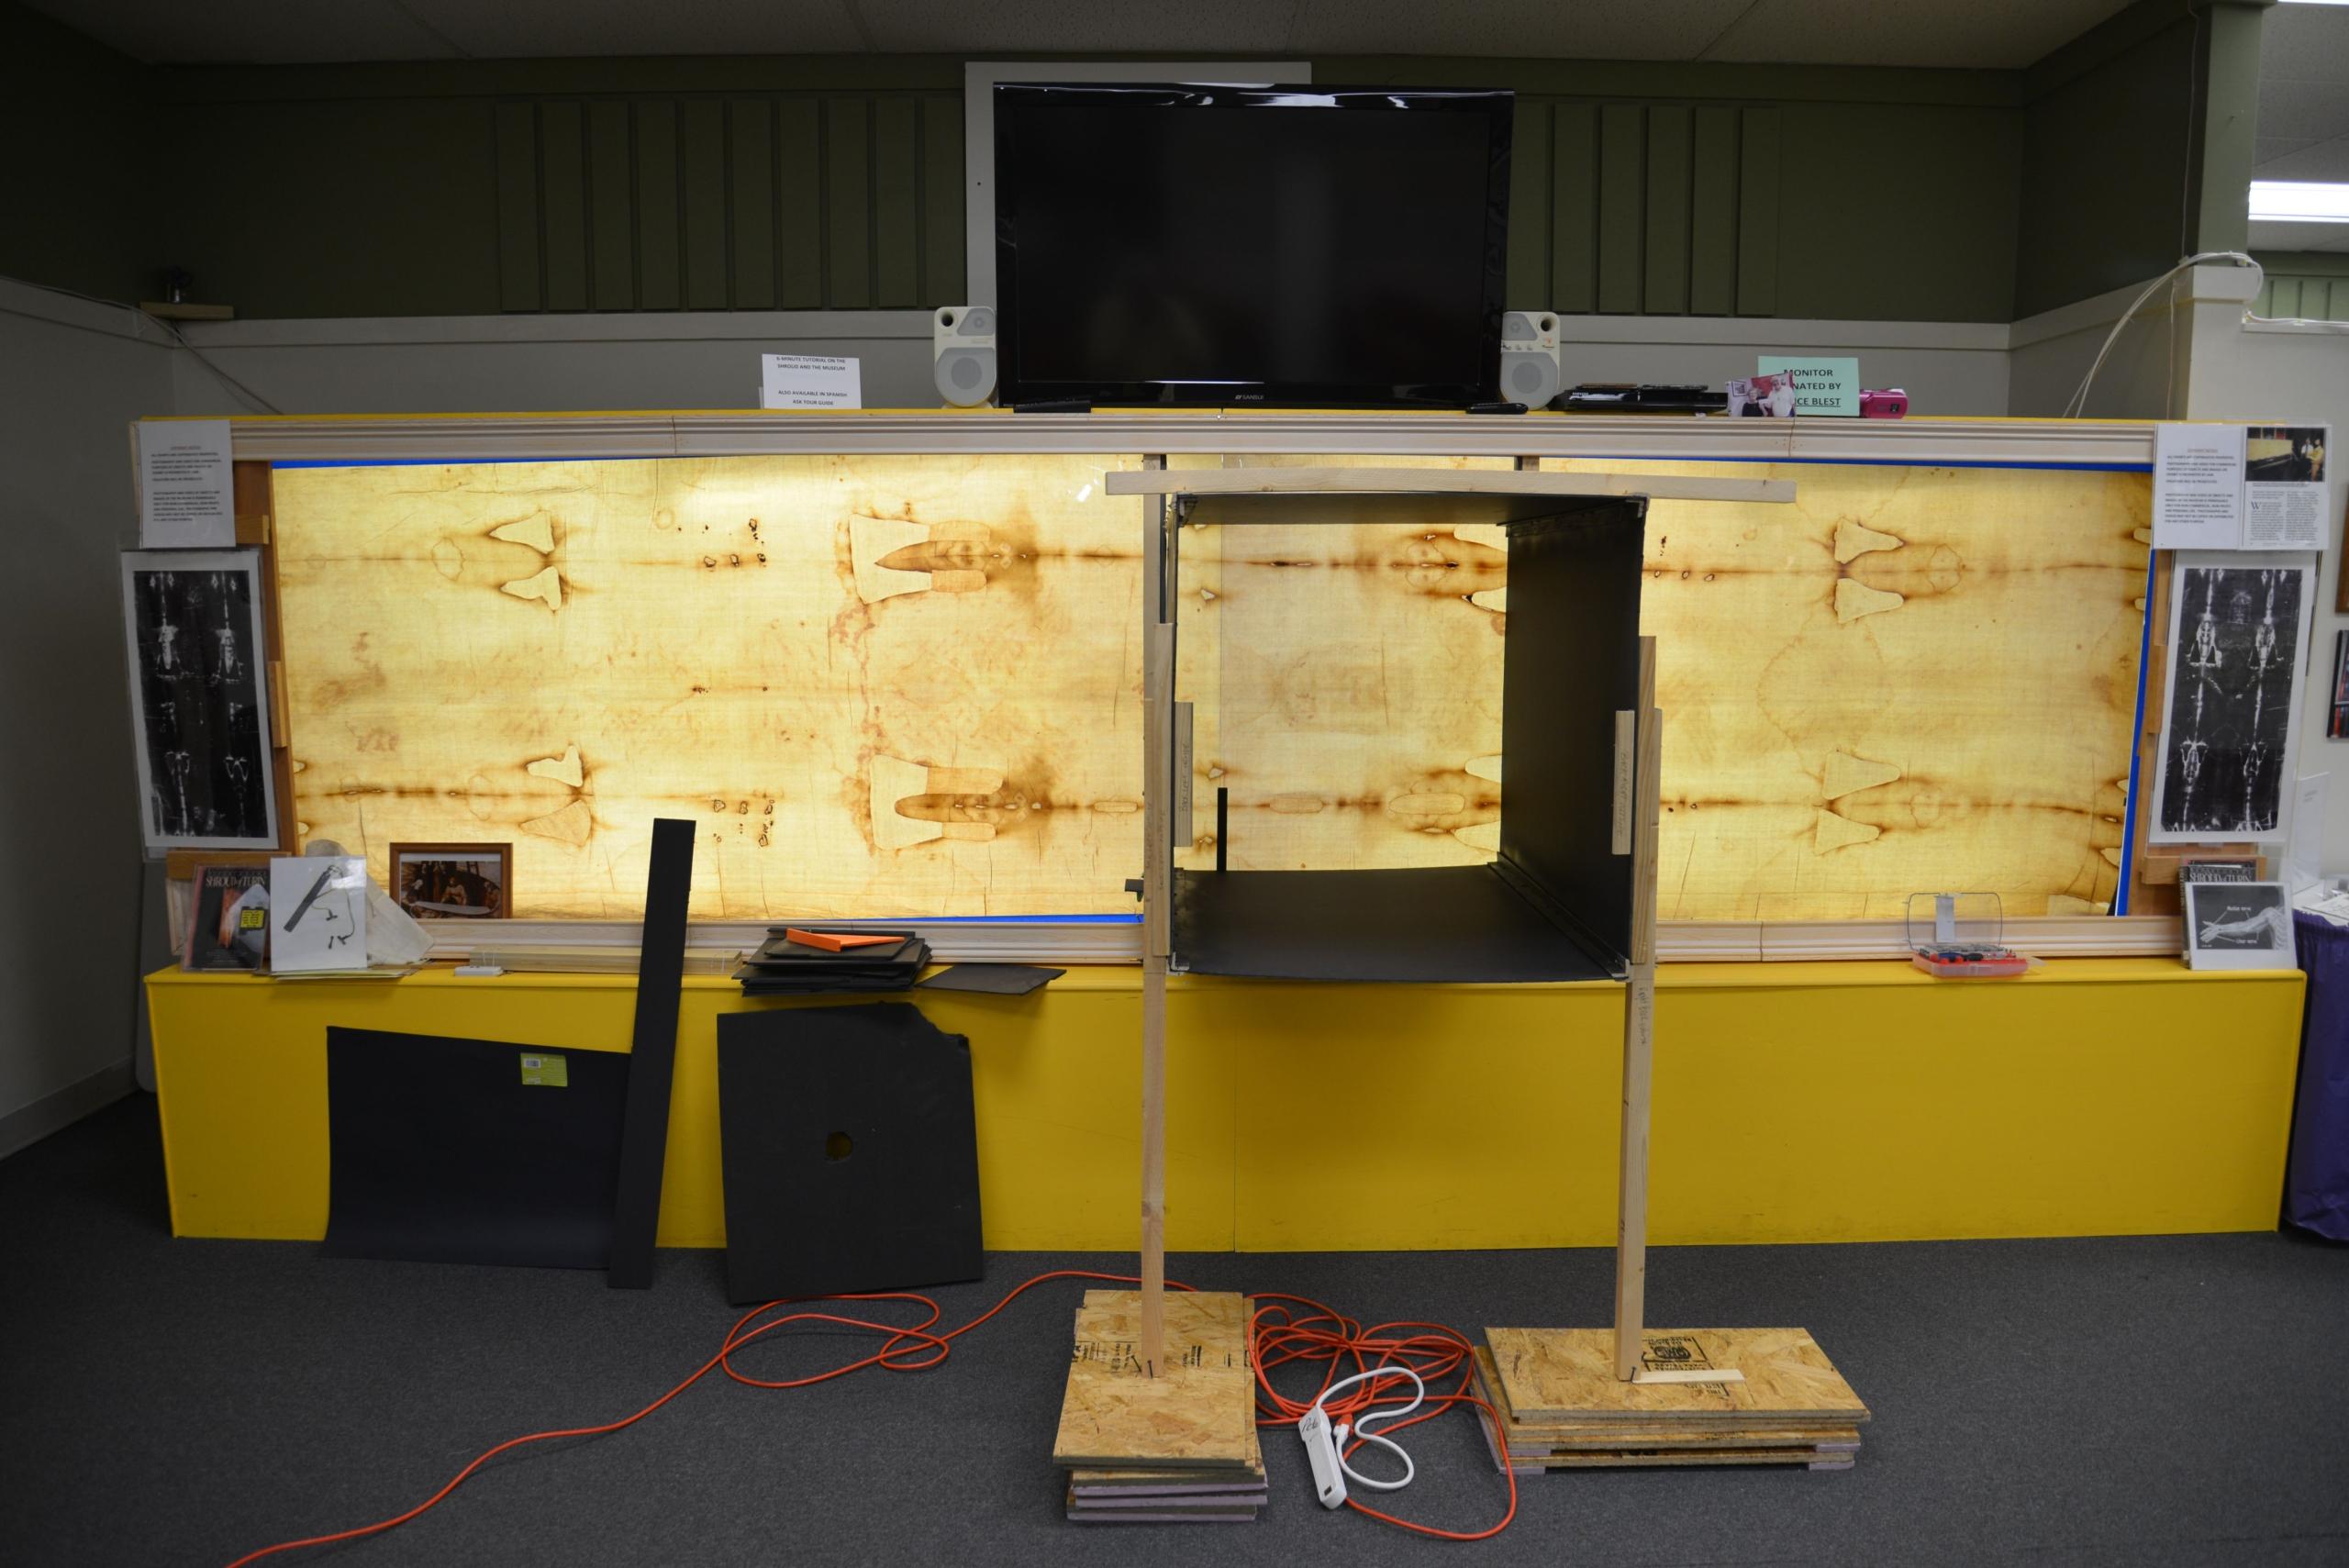 Photo B. Preparing research set-up